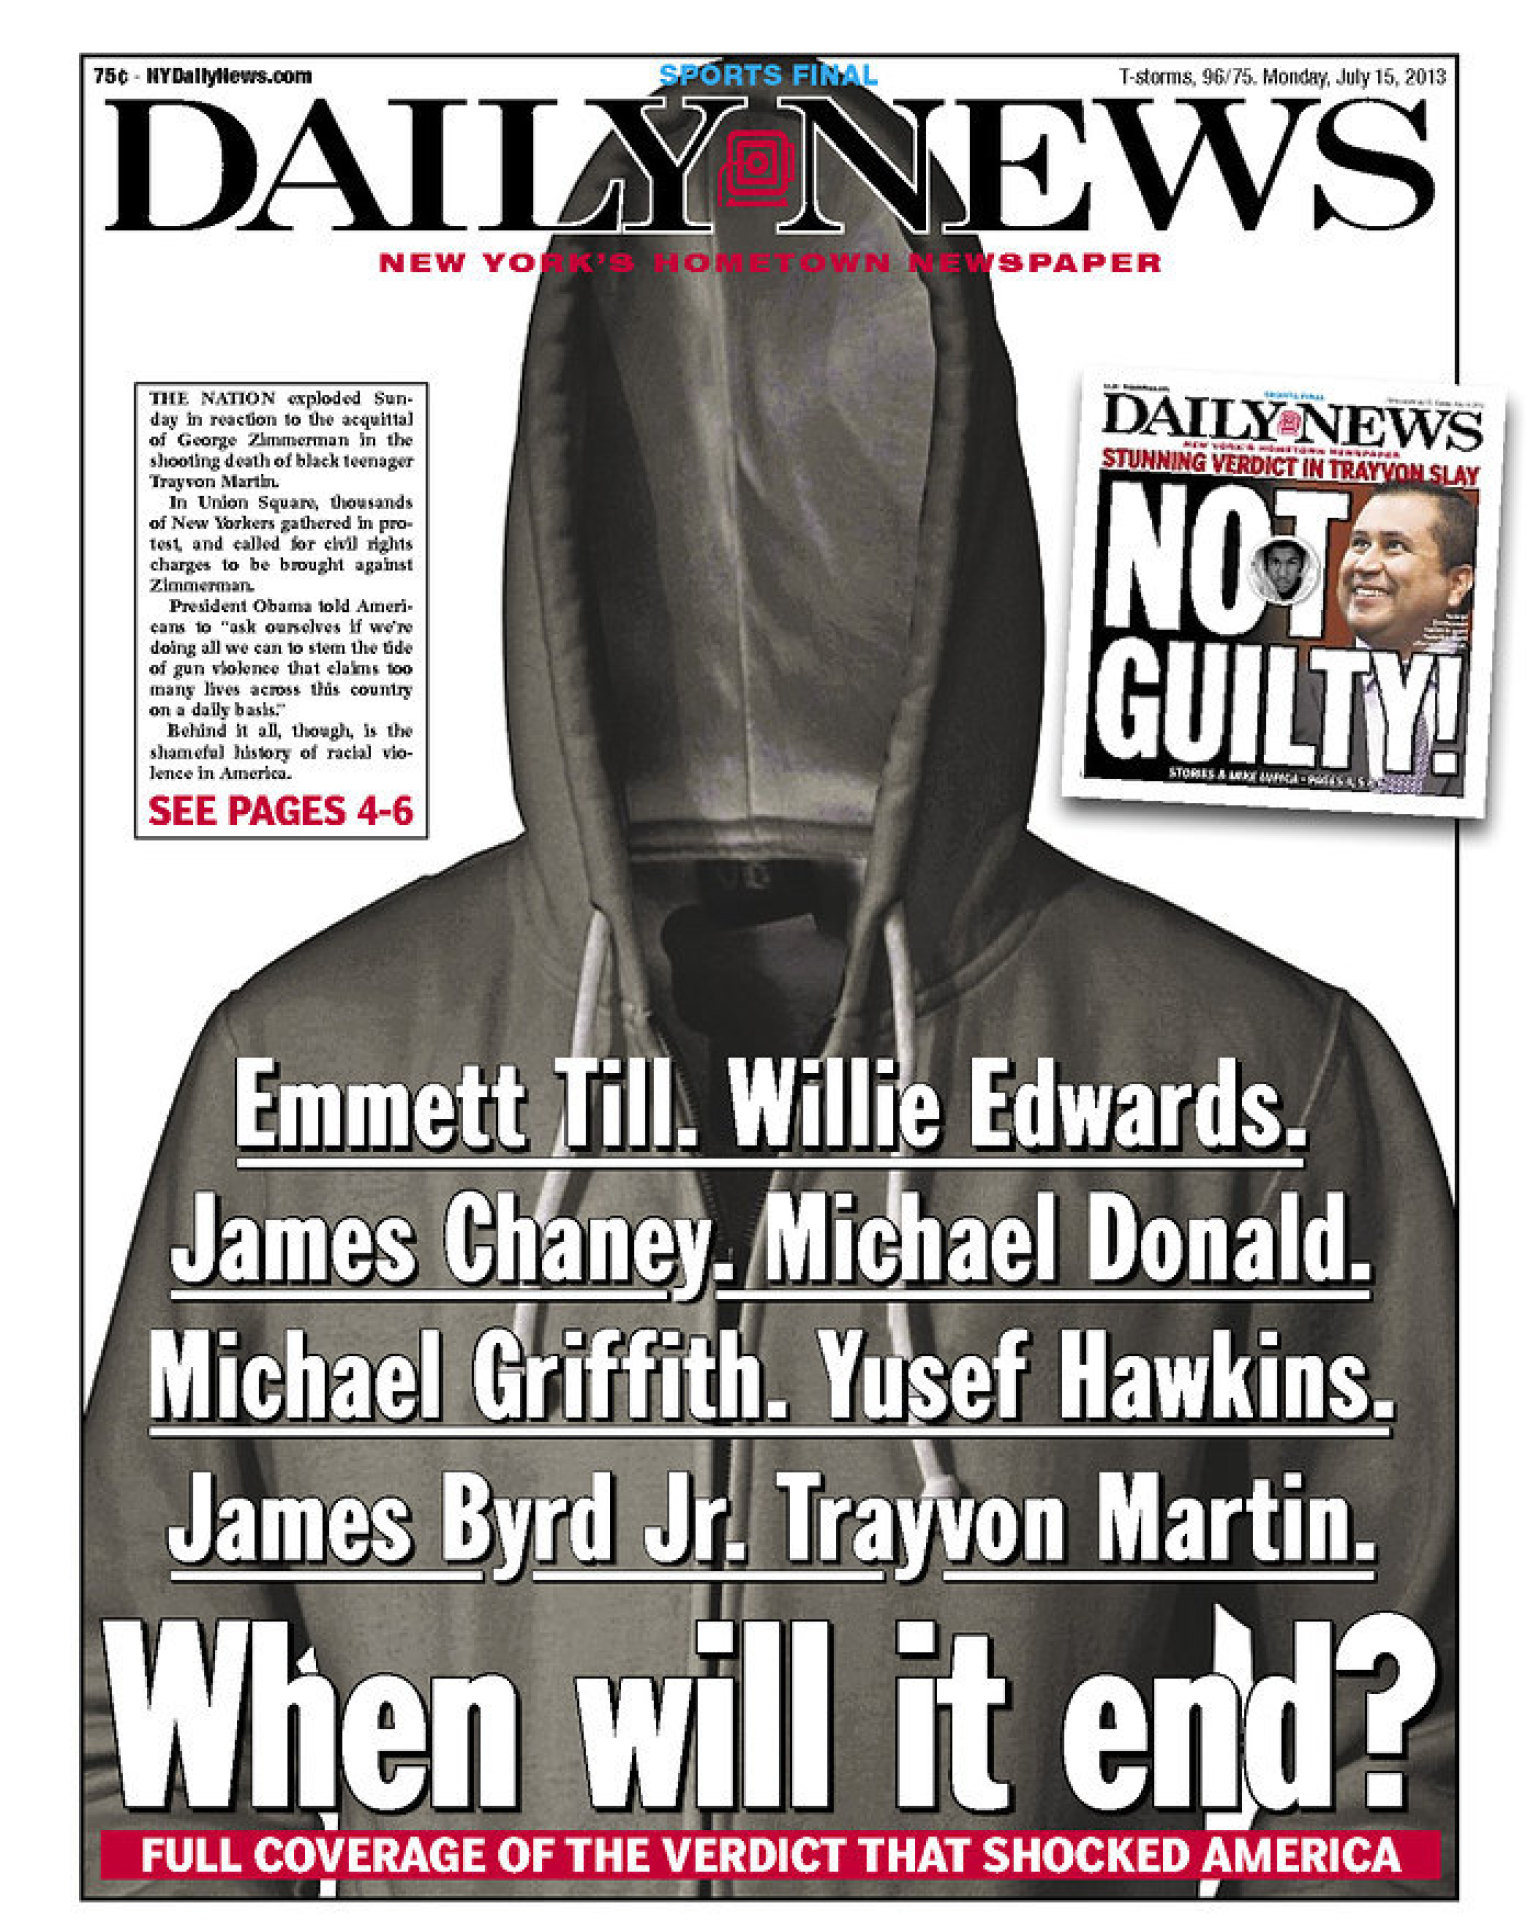 New York Daily News: NY Daily News' Powerful Trayvon Martin Front Page (PHOTO